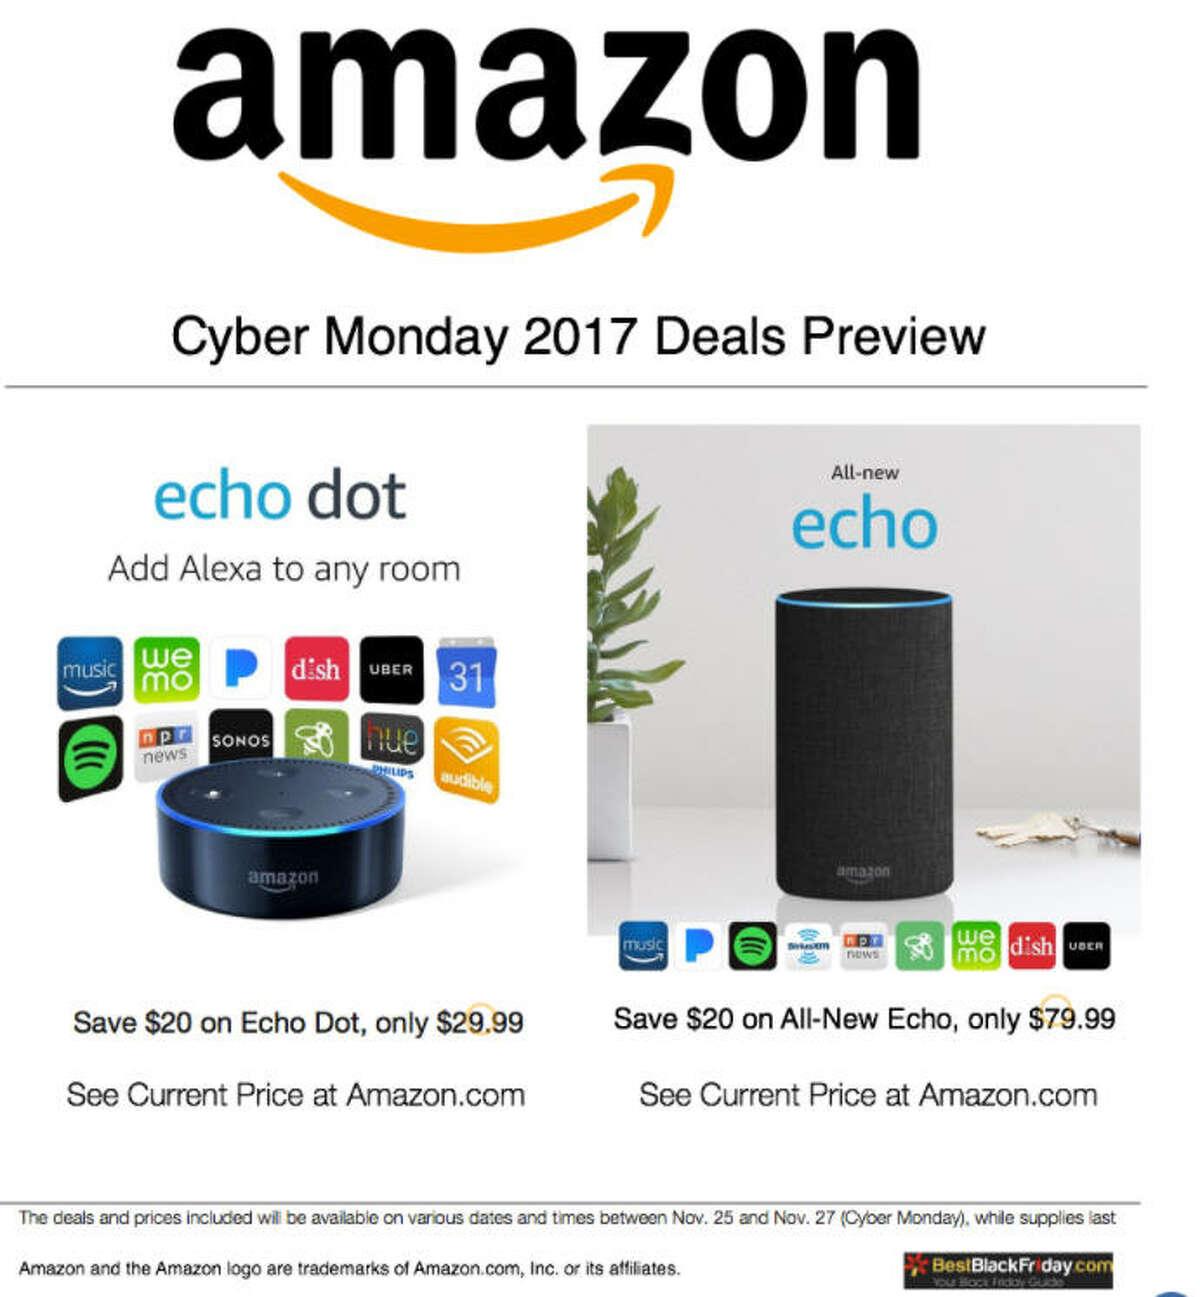 Amazon Amazon Echo Dot for $29.99 (save $20)